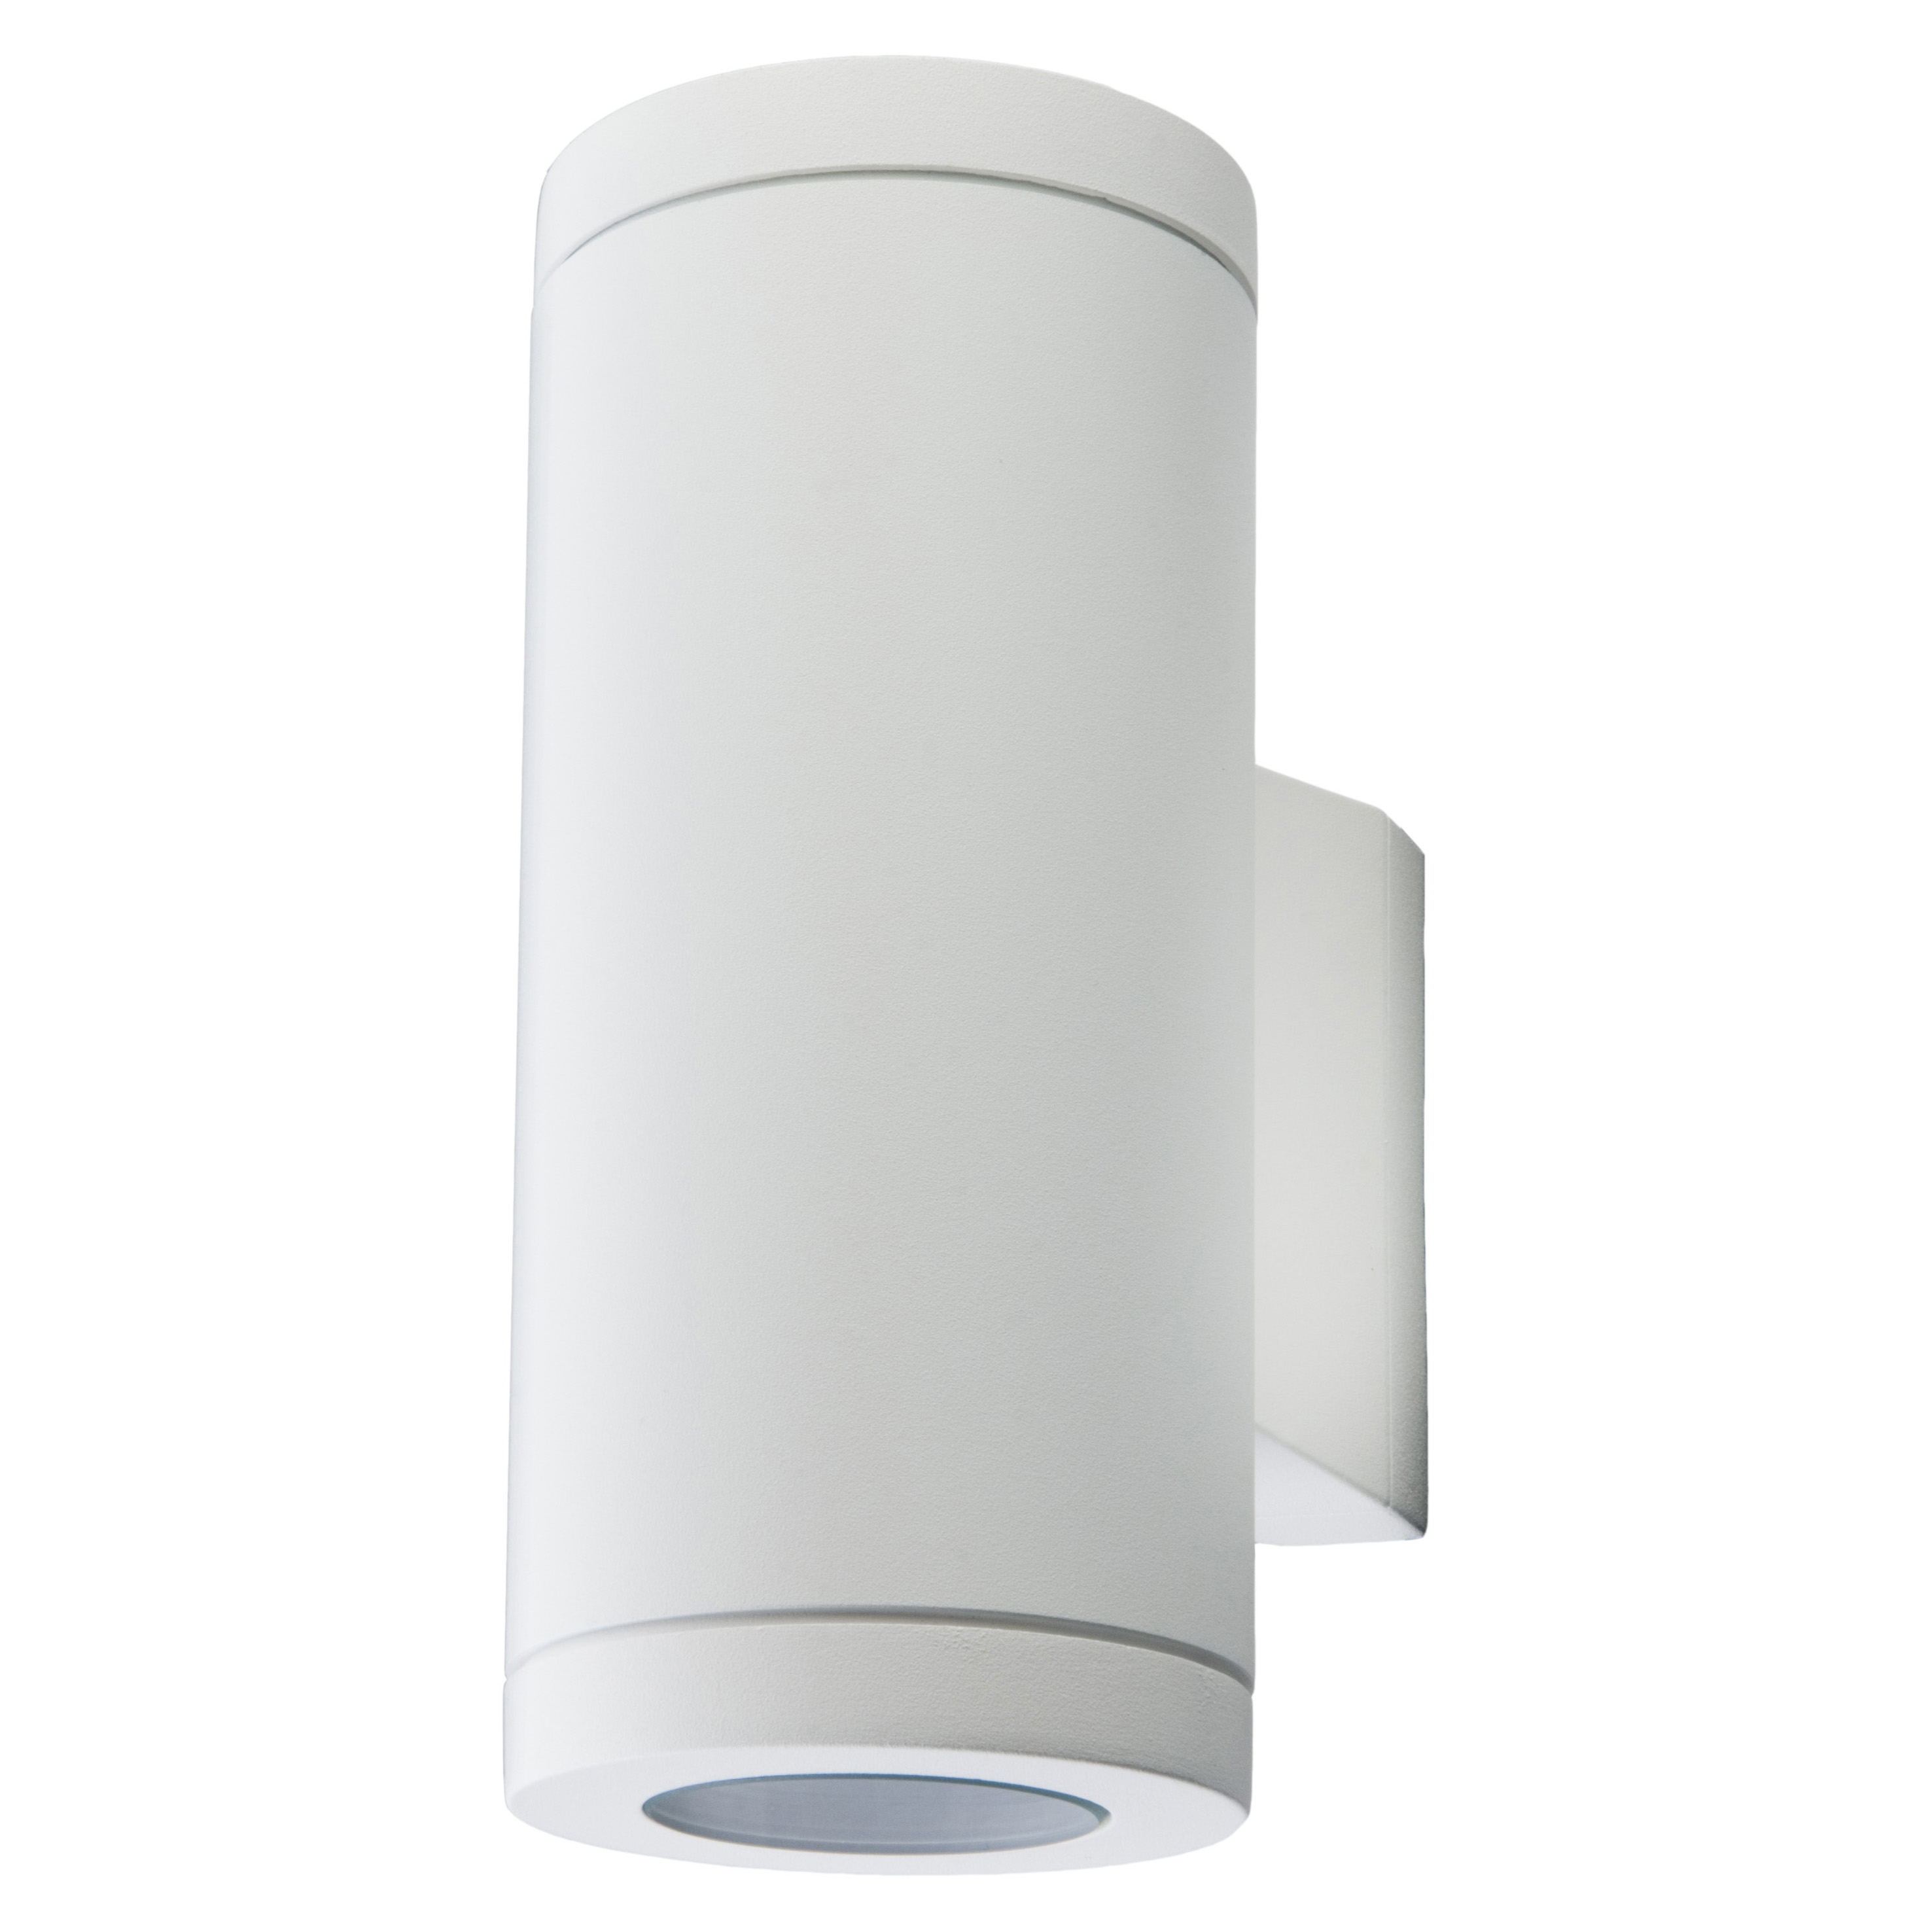 sg lighting led metro 2 wit 35w gu10 611692 wand rond. Black Bedroom Furniture Sets. Home Design Ideas